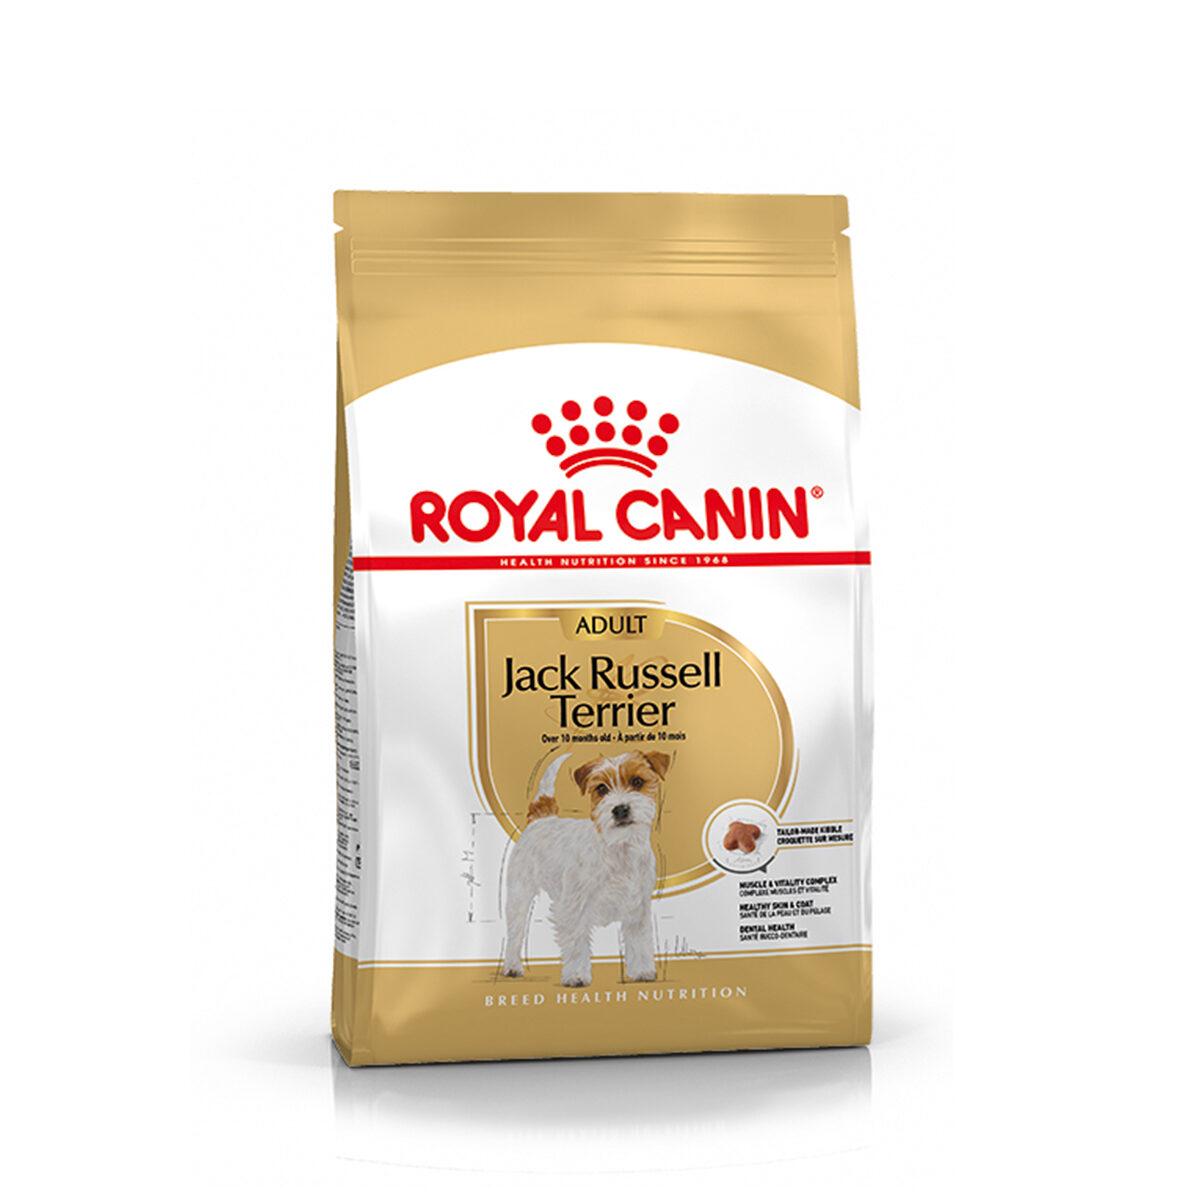 Royal Canin Jack Russell Terrier Adult Hondenvoer 3 kg